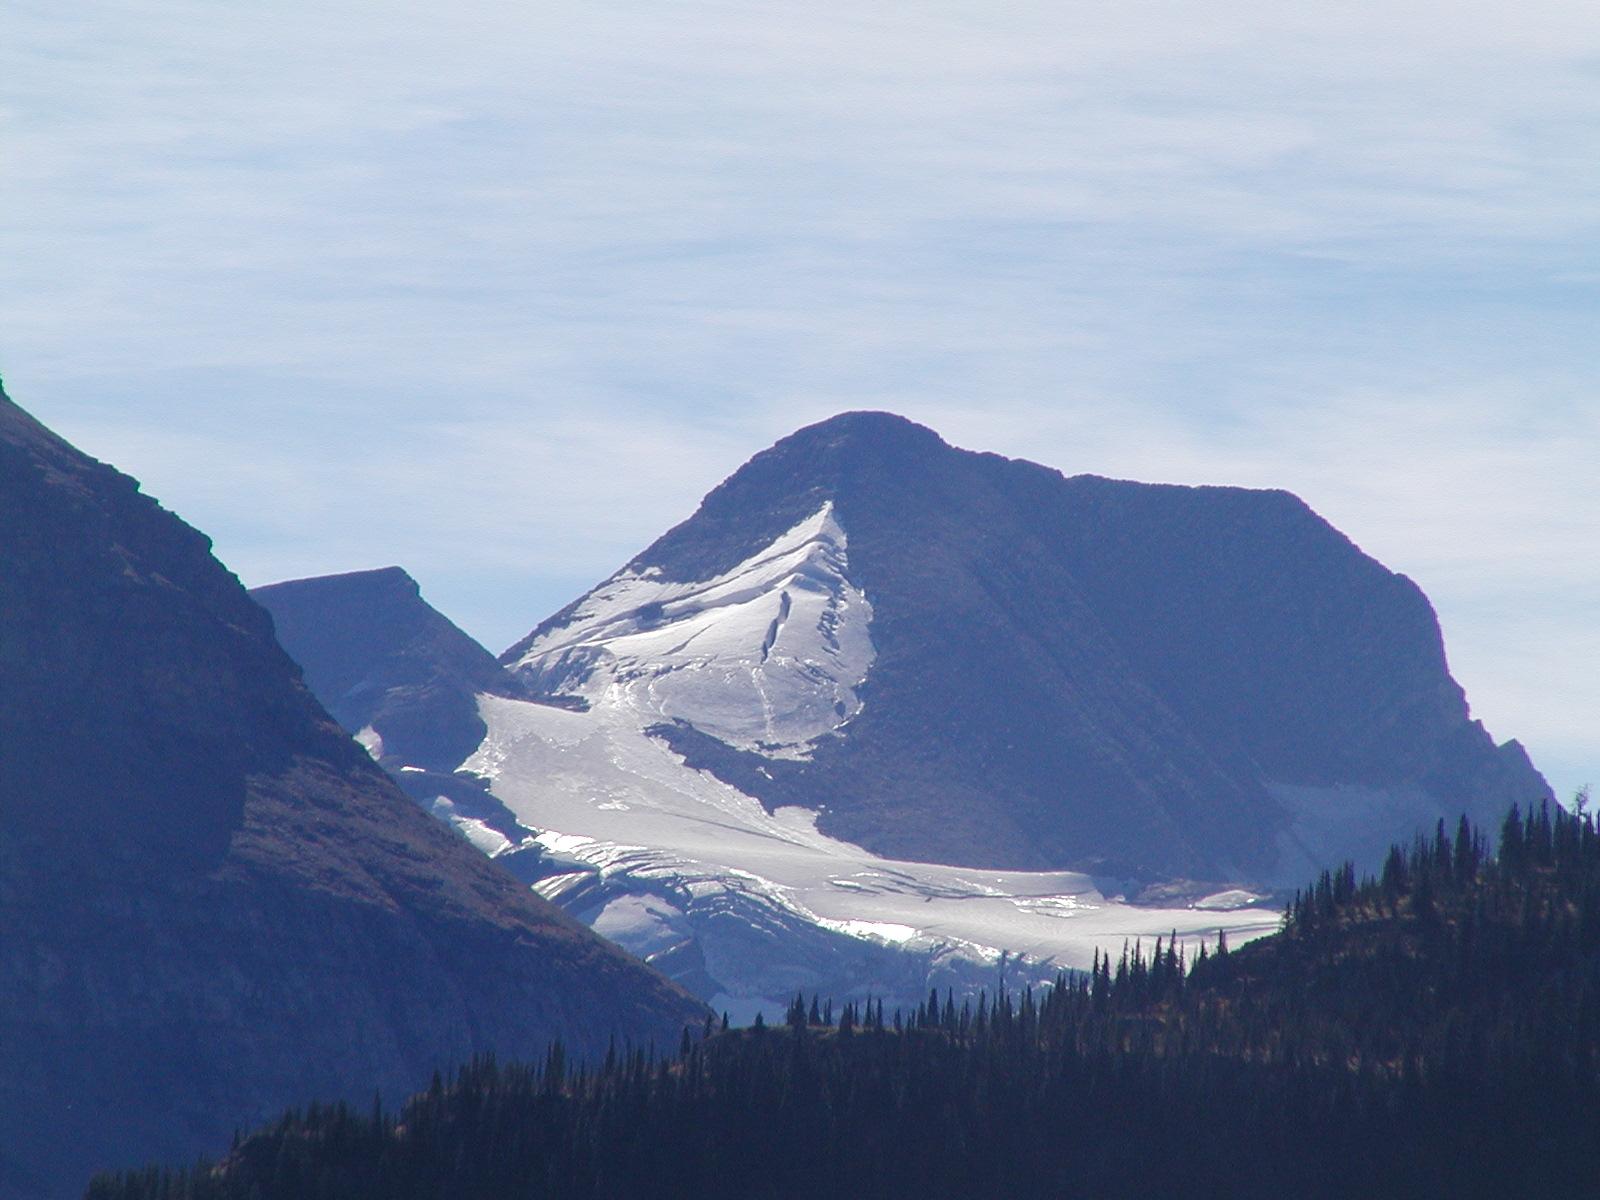 Jackson Glacier, Glacier National Park, Montana Photo by Cristina Eisenberg